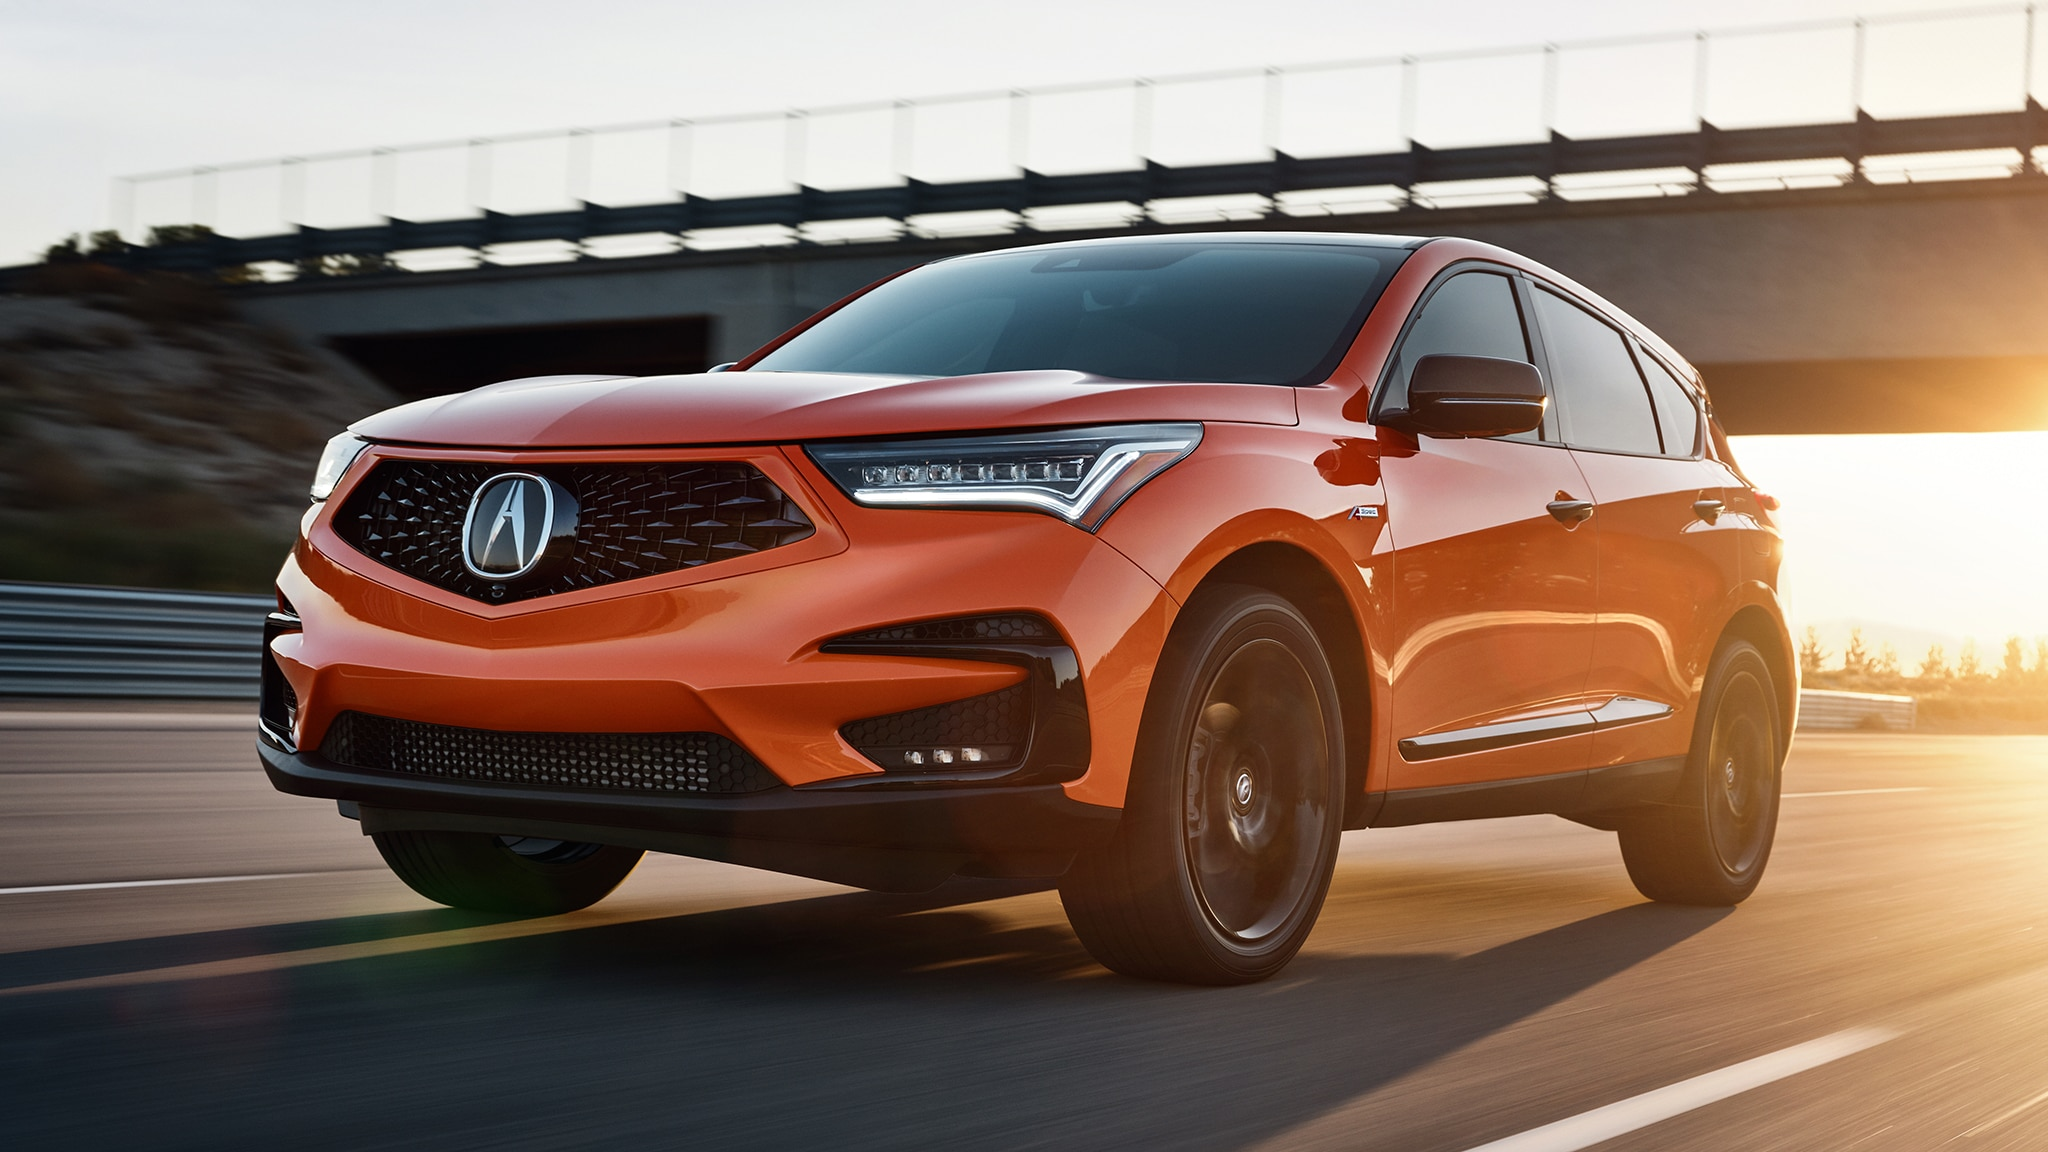 2021 Acura RDX Gets Very, Very Orange PMC Edition